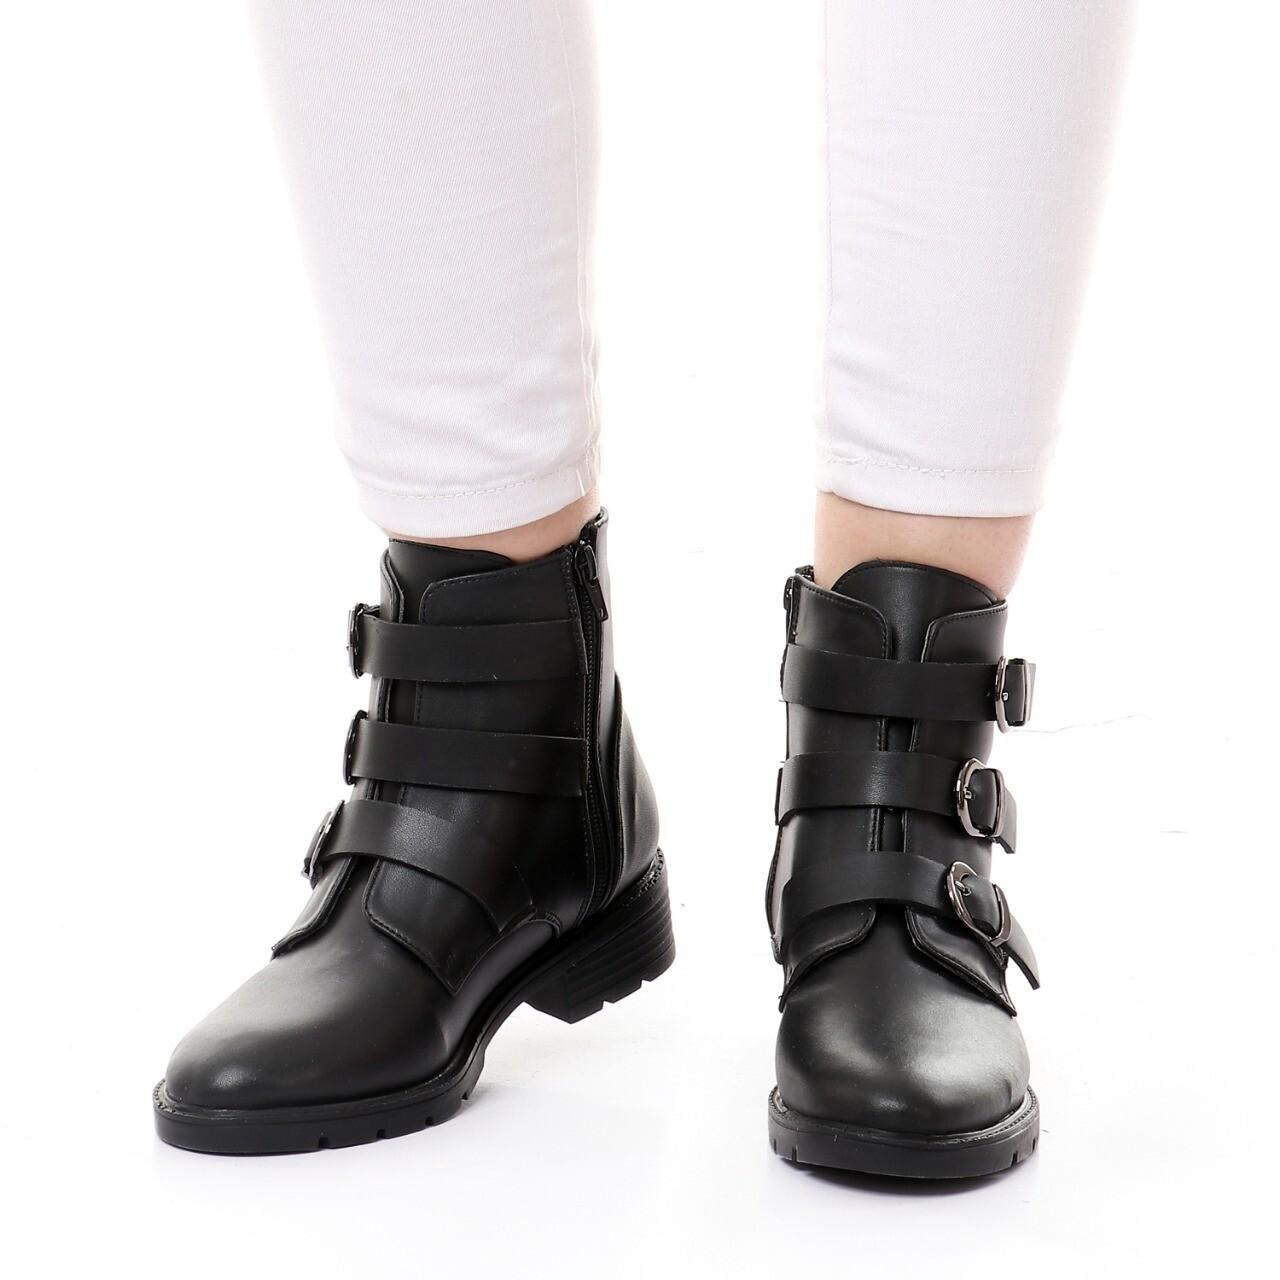 3751 Half Boot - Black